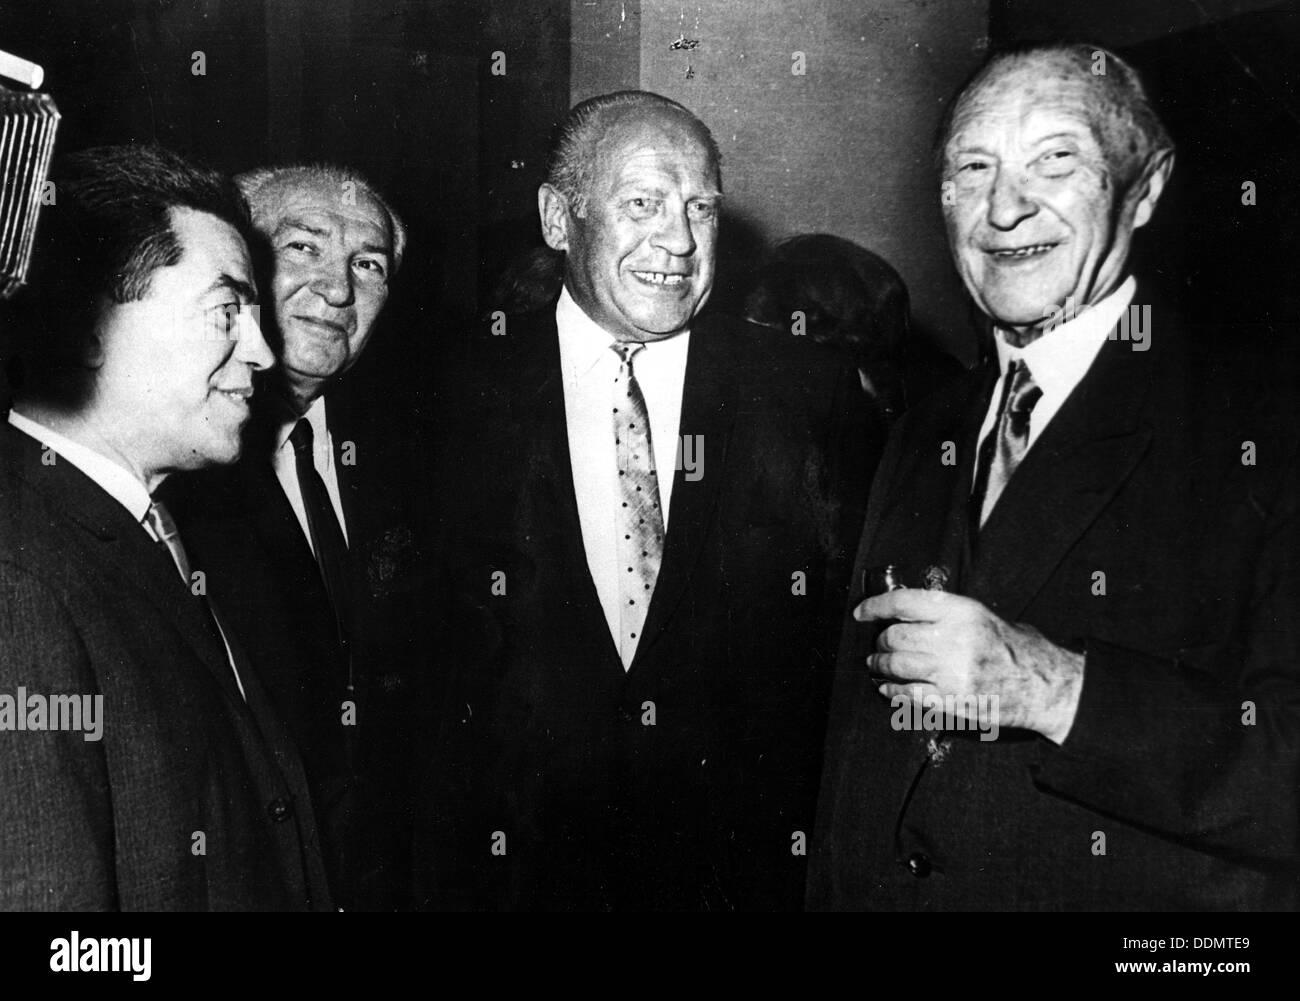 Oscar Schindler (1908-1978), German businessman. - Stock Image